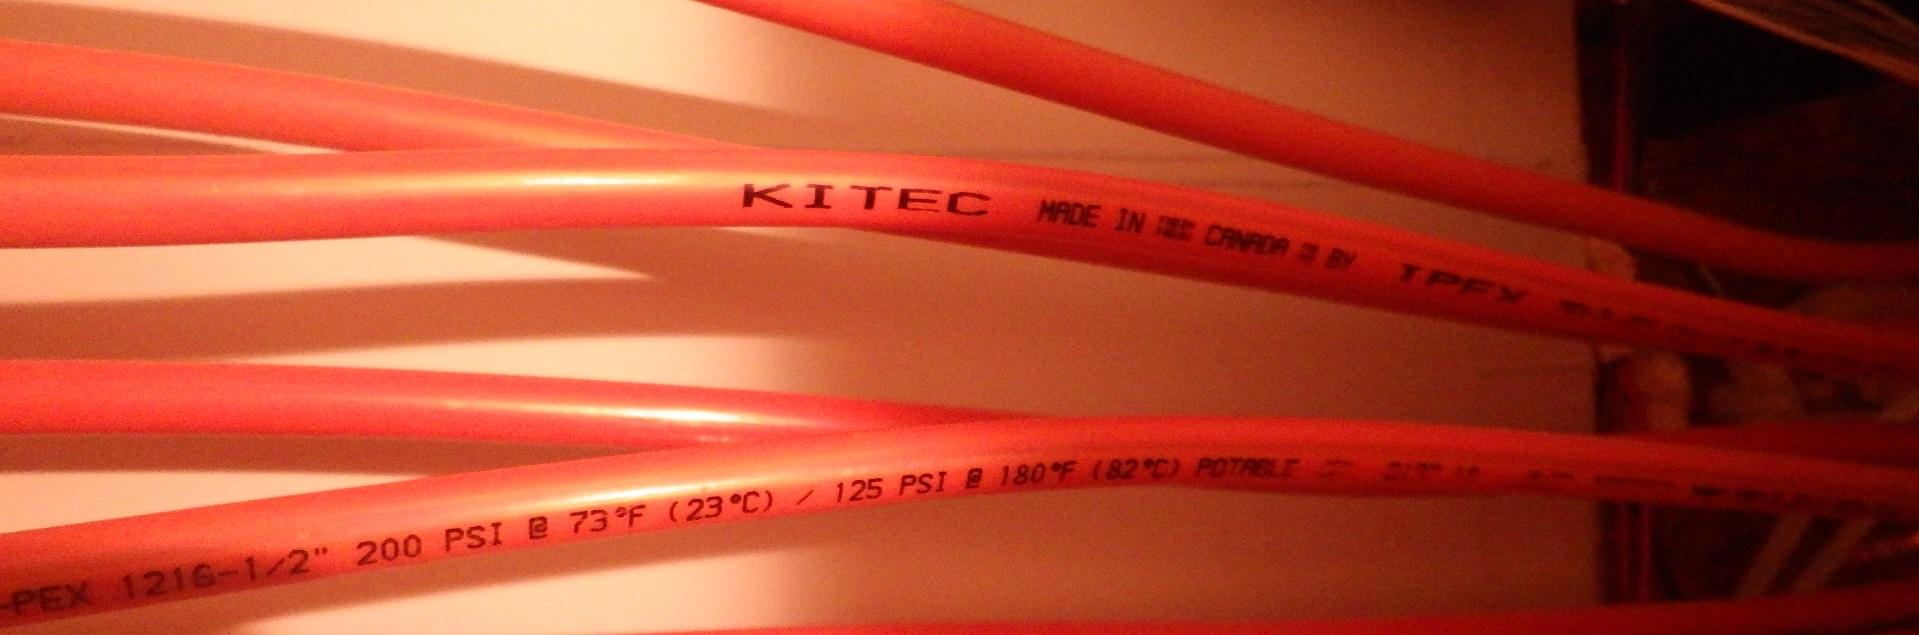 Kitec Plumbing Heeley Home Inspection Serving Guelph Cambridge